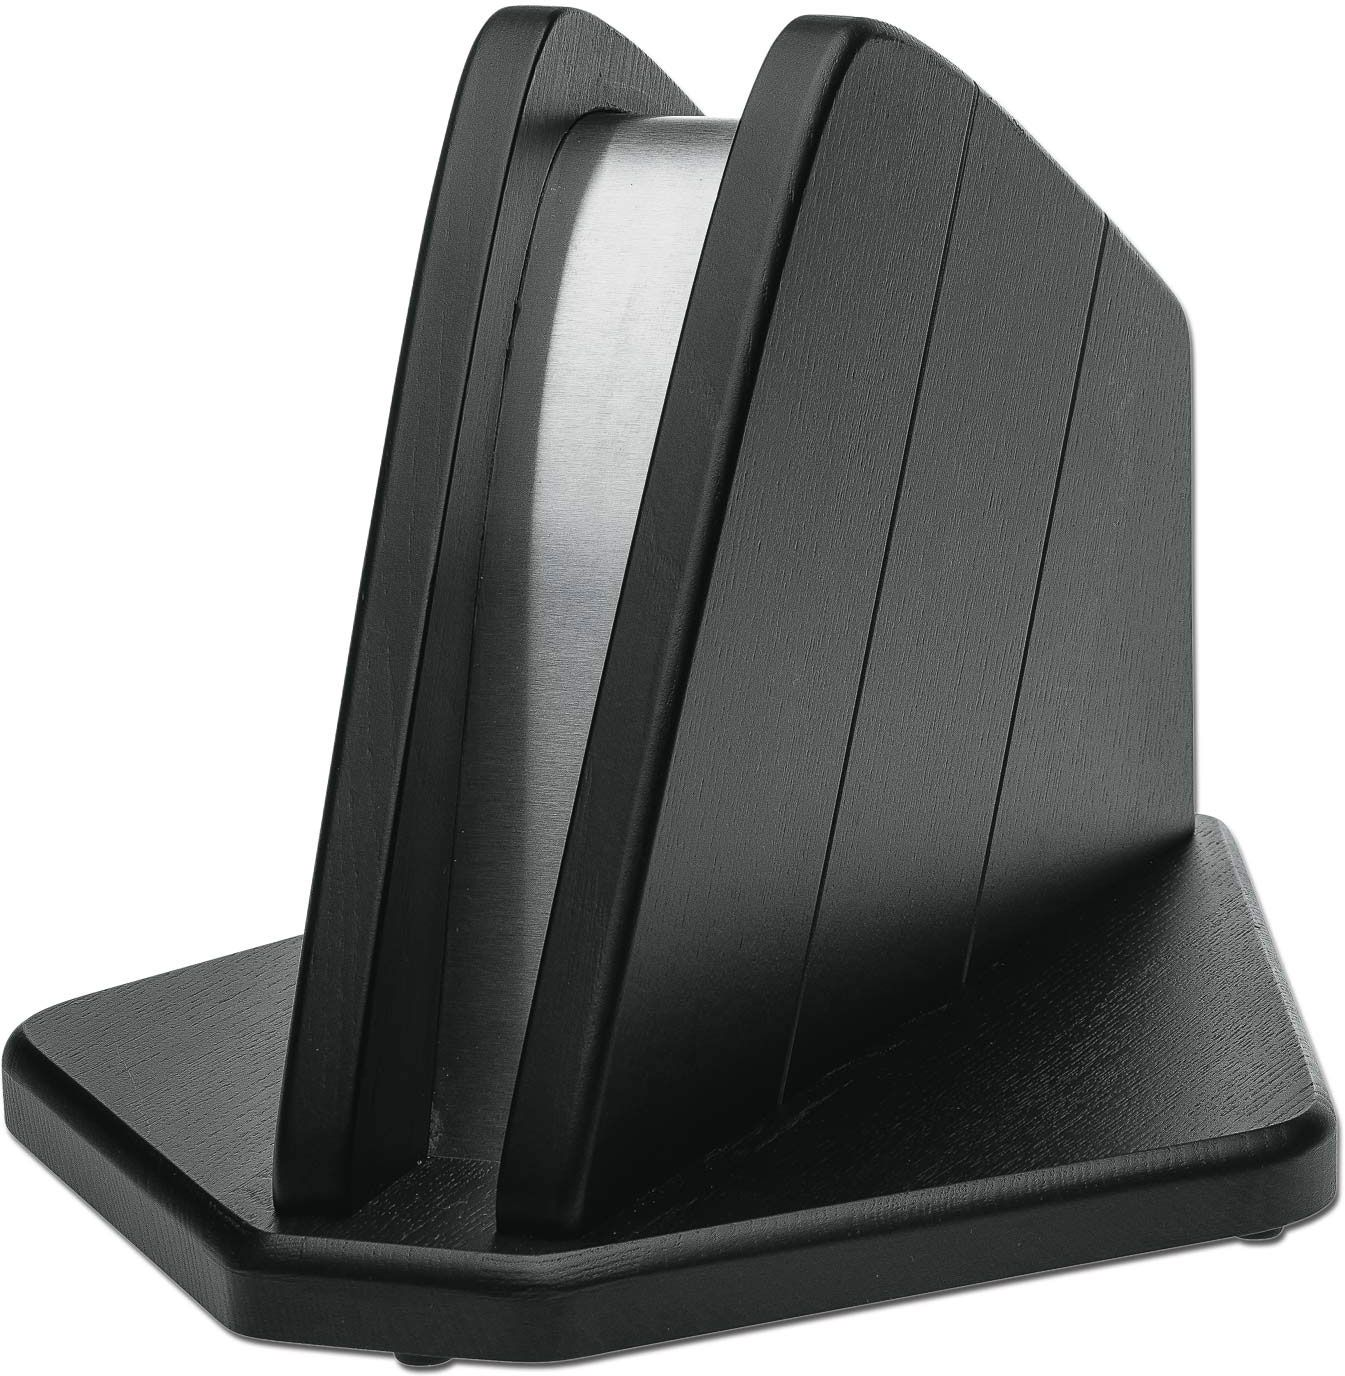 Boker Forge Series Magnetic Kitchen Knife Block, Black